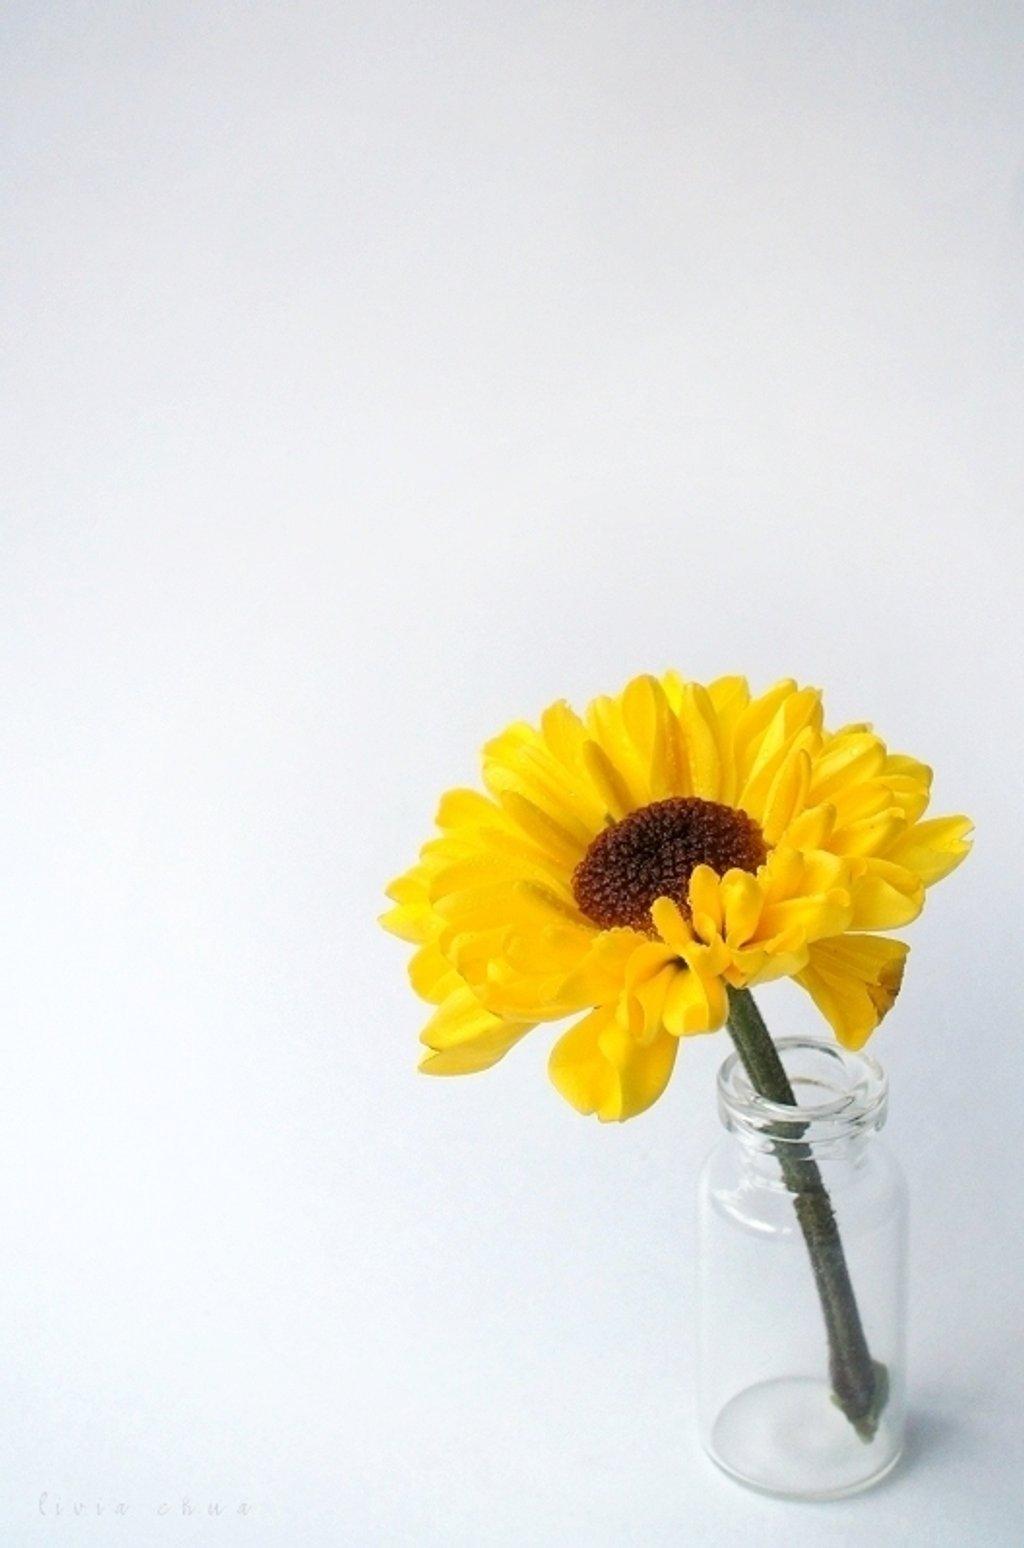 Sunshine In A Bottle by myautofocuslife